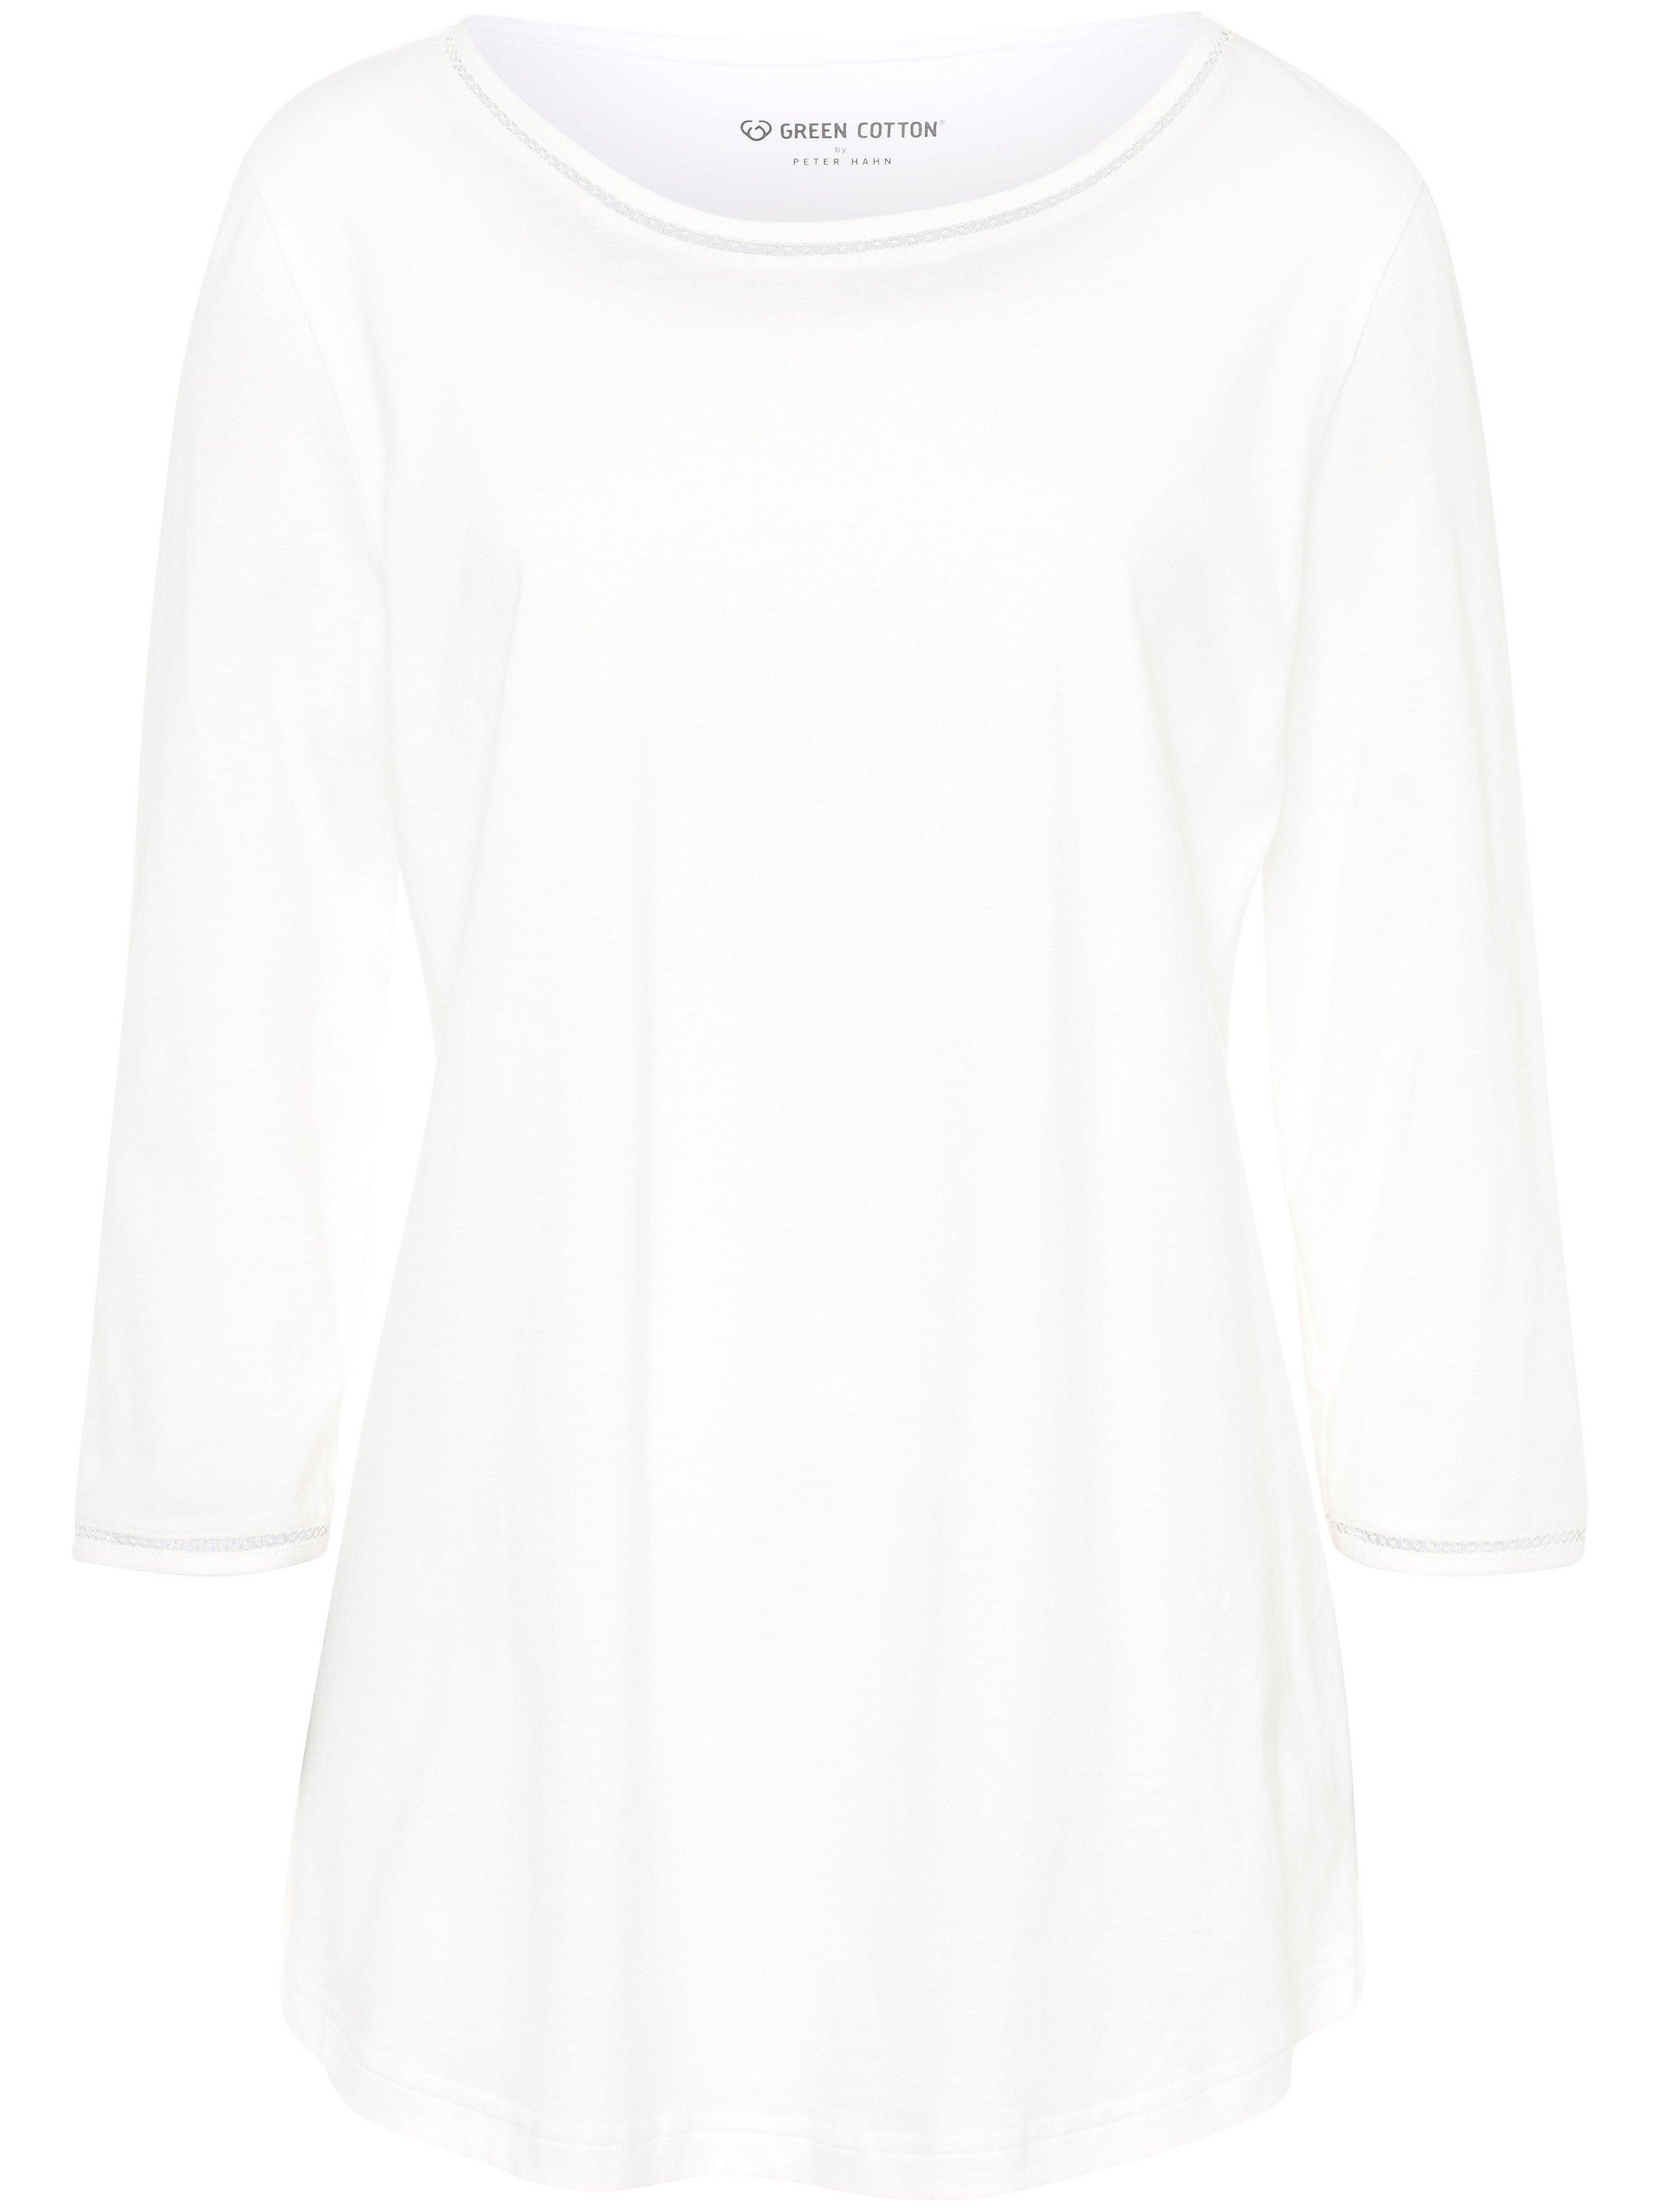 Round neck top in 100% cotton Green Cotton white